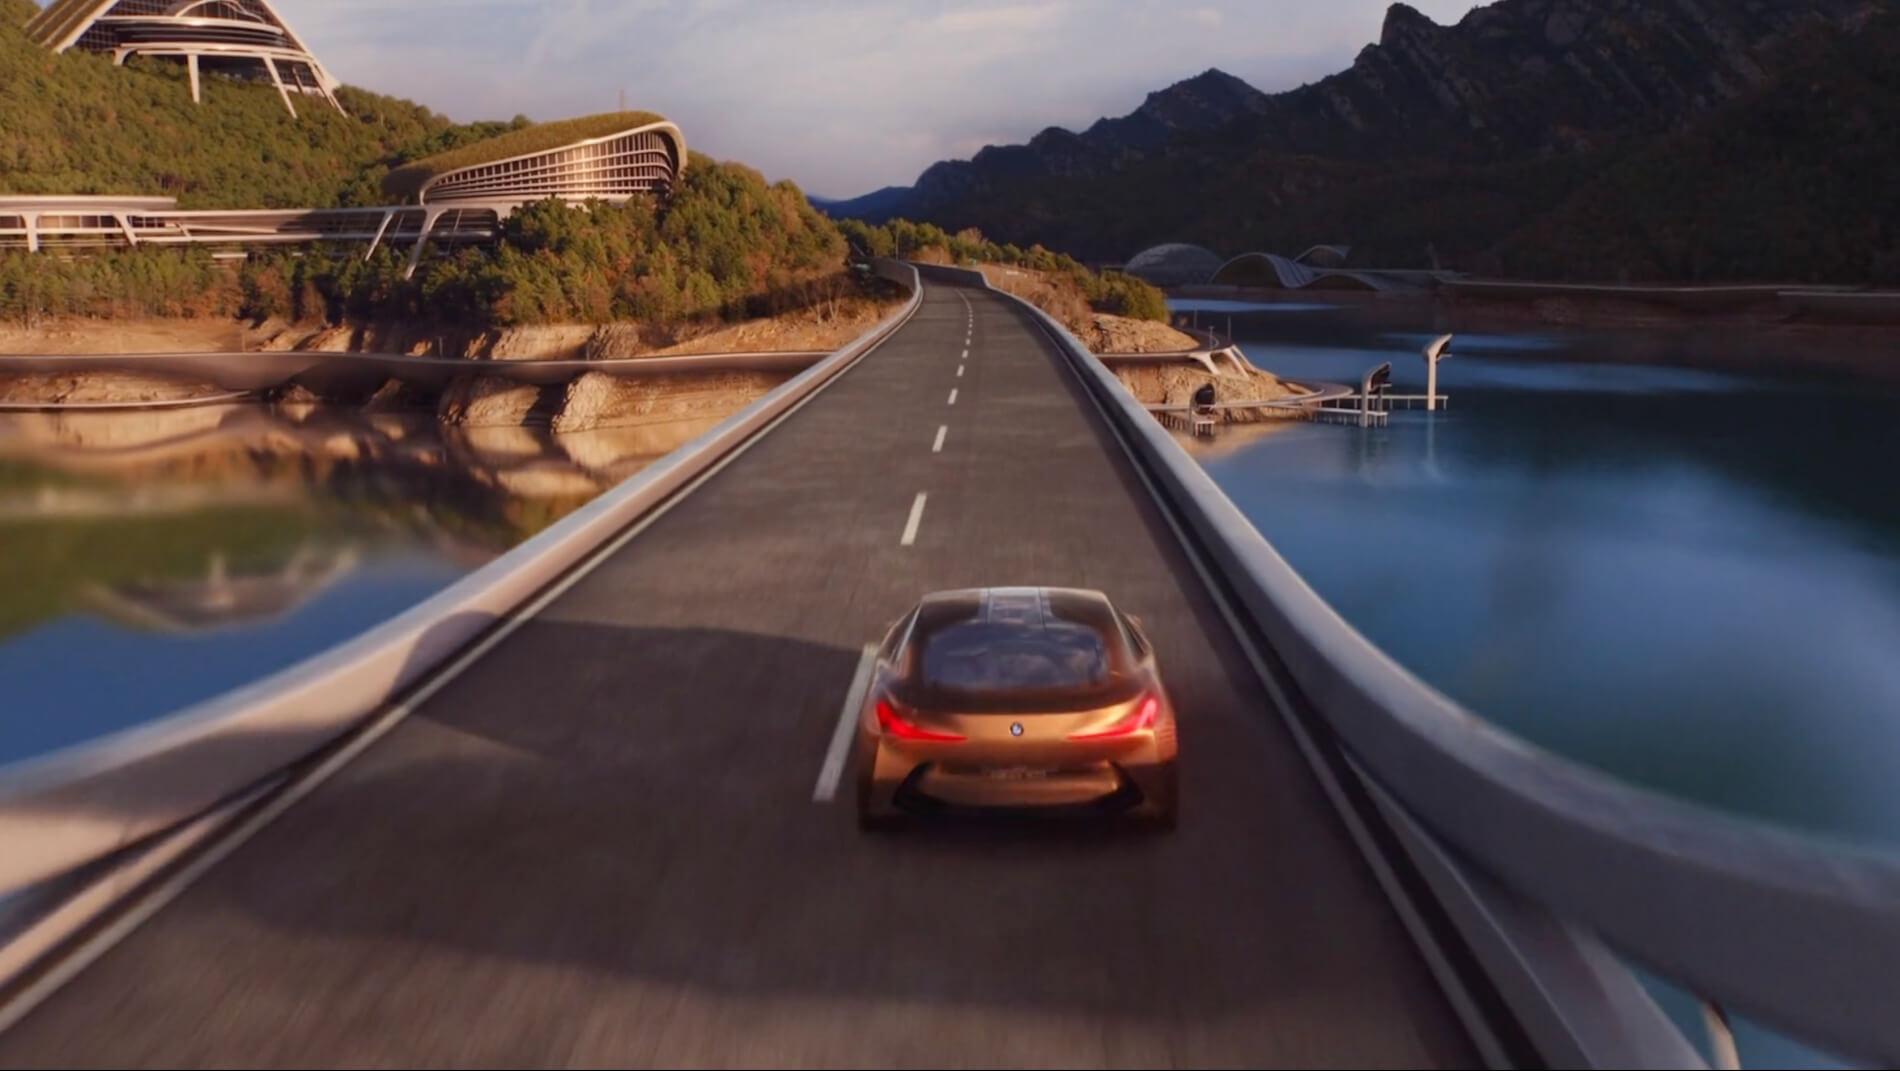 Logxon-Werbung-Scan-der-Umgebung-fuer VFX-Shot-einer-BMW-Werbung-Drohne-BMW-Barcelona-VFX-U-Processing-Media-Virtual-Reality-VR